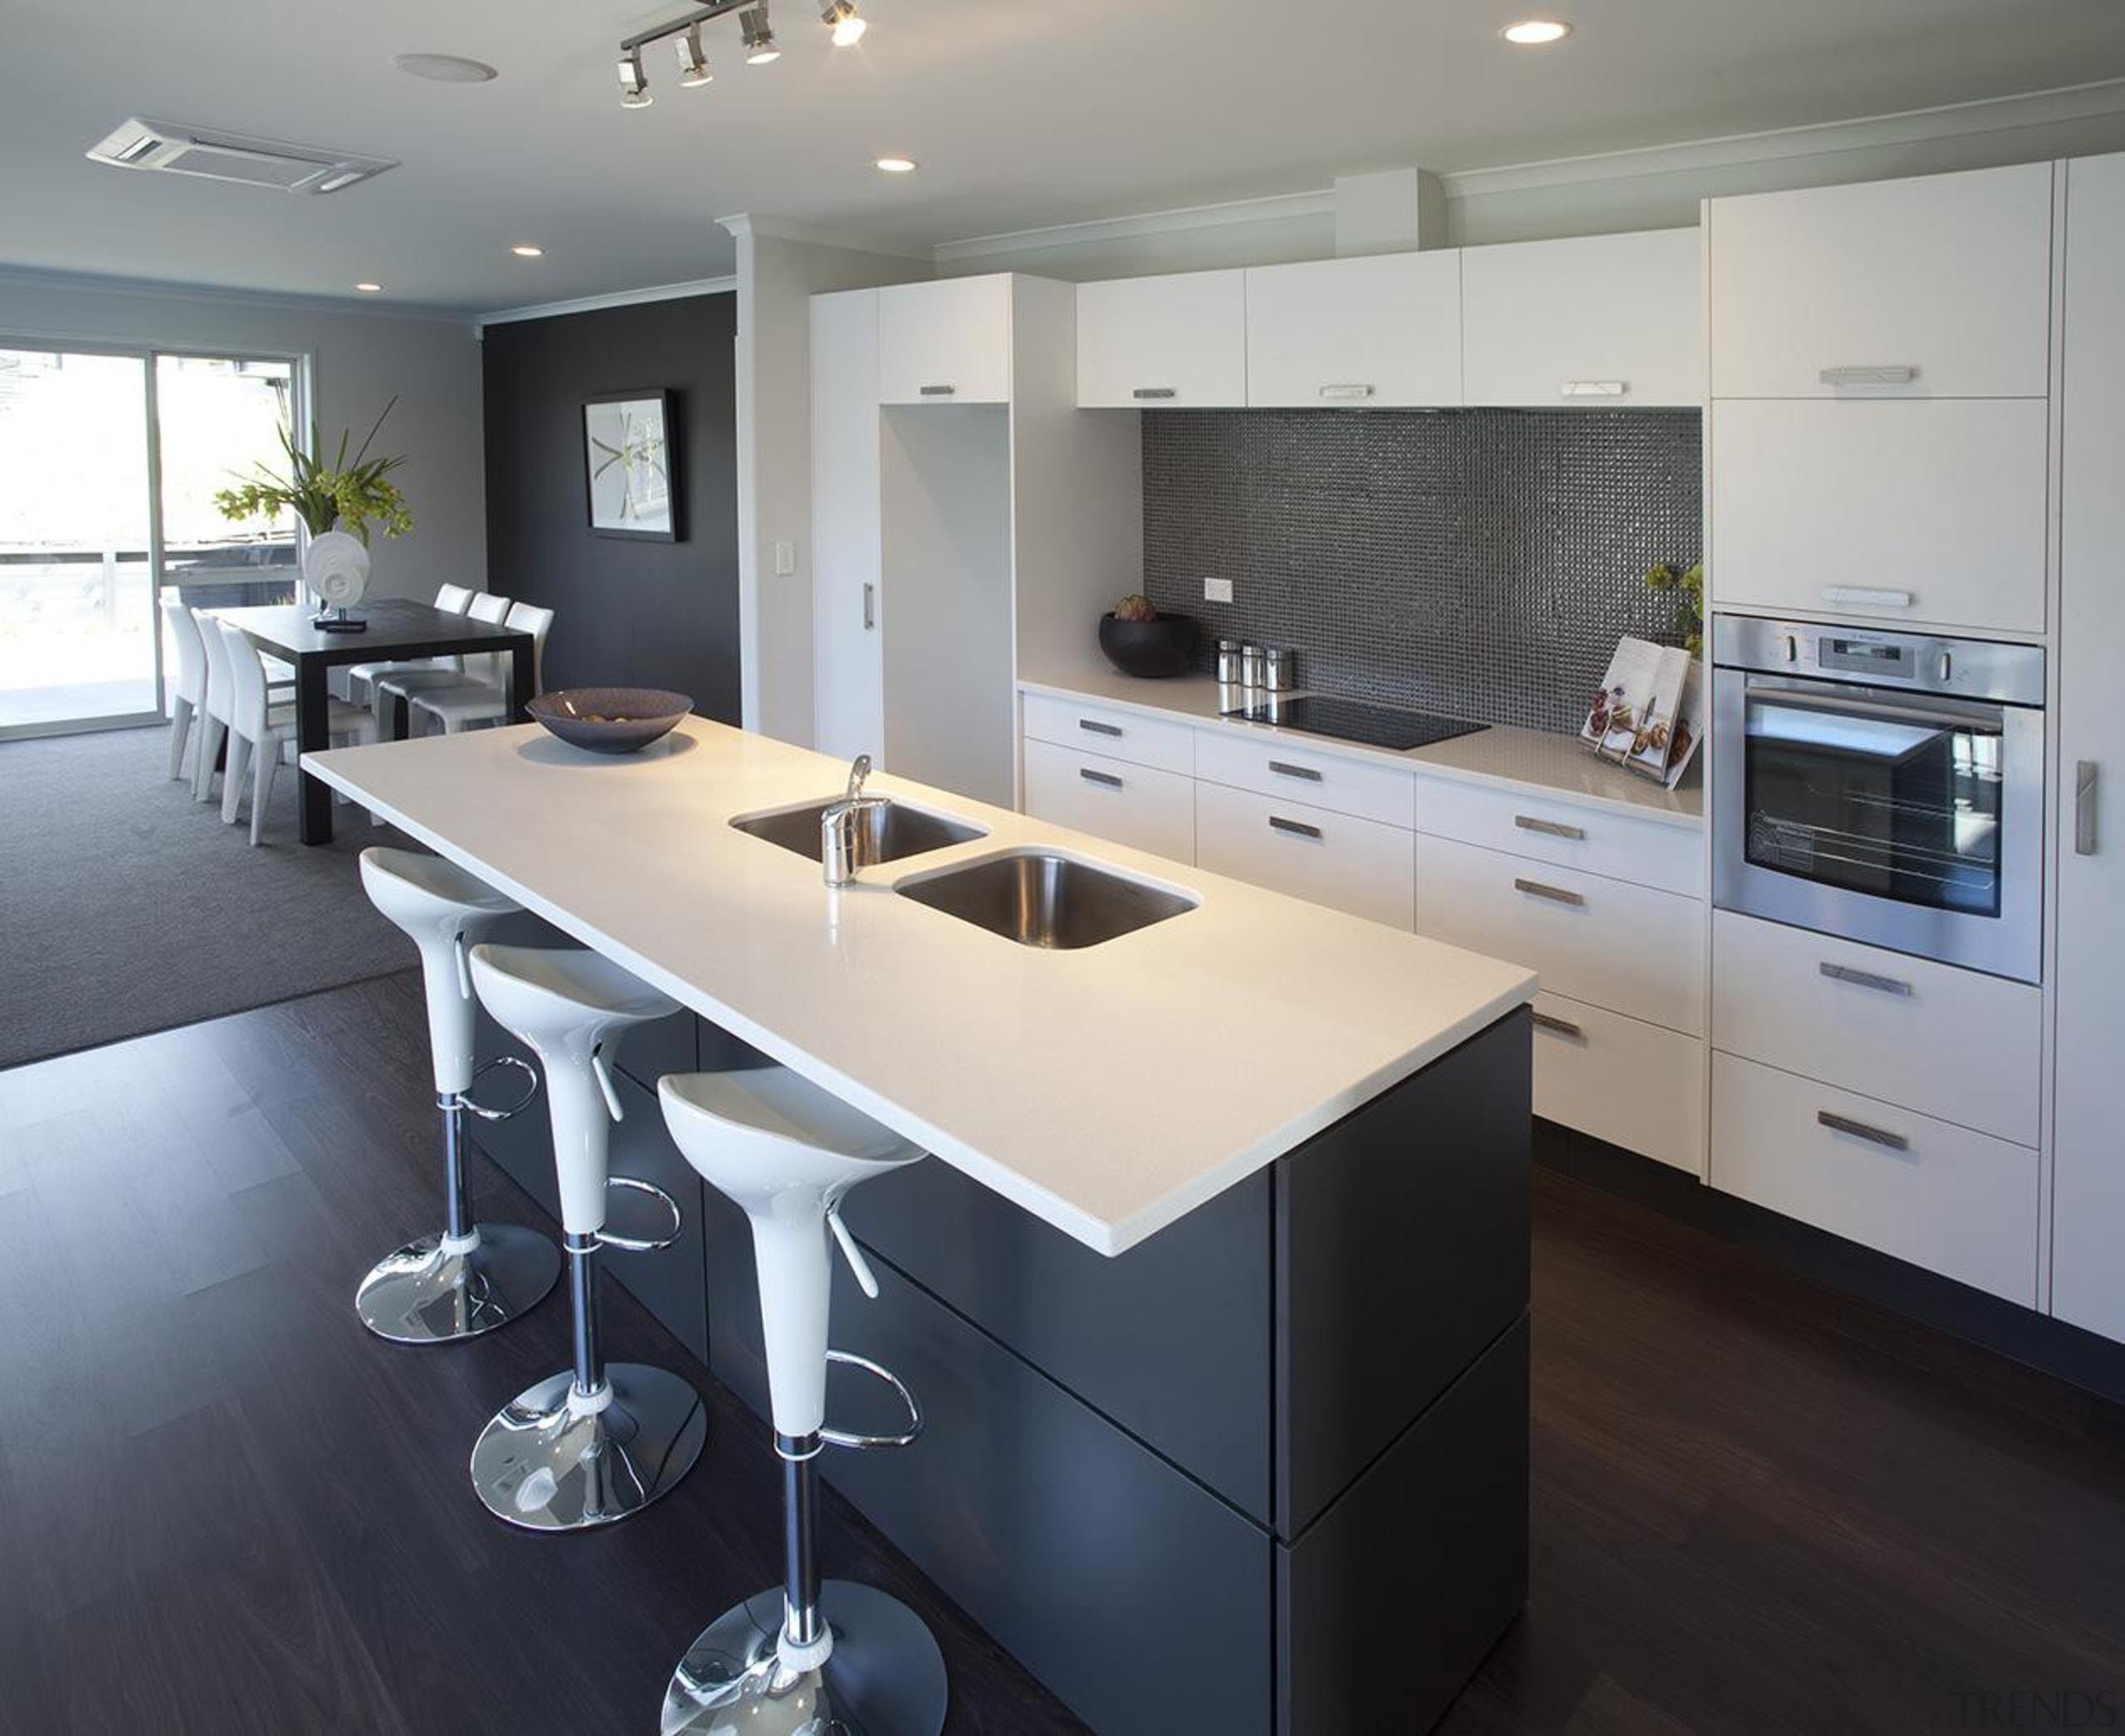 For more information, please visit www.gjgardner.co.nz countertop, interior design, kitchen, real estate, room, gray, black